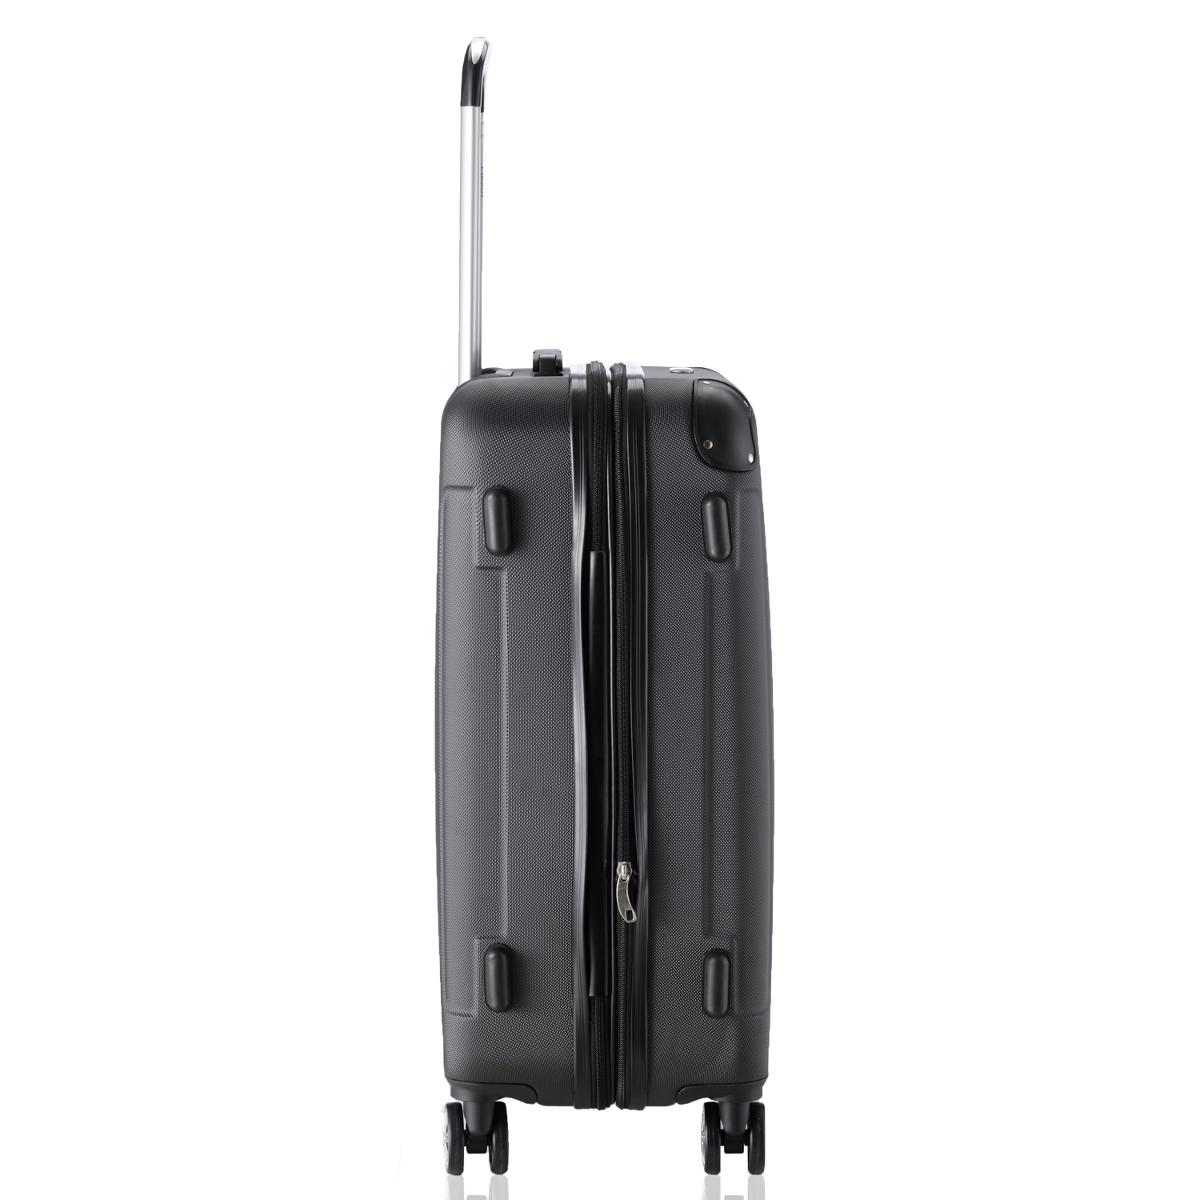 Koffer-Flexot-2045-Hartschalenkoffer-Trolley-Kofferset-Reisekoffer-M-L-XL-Set Indexbild 38